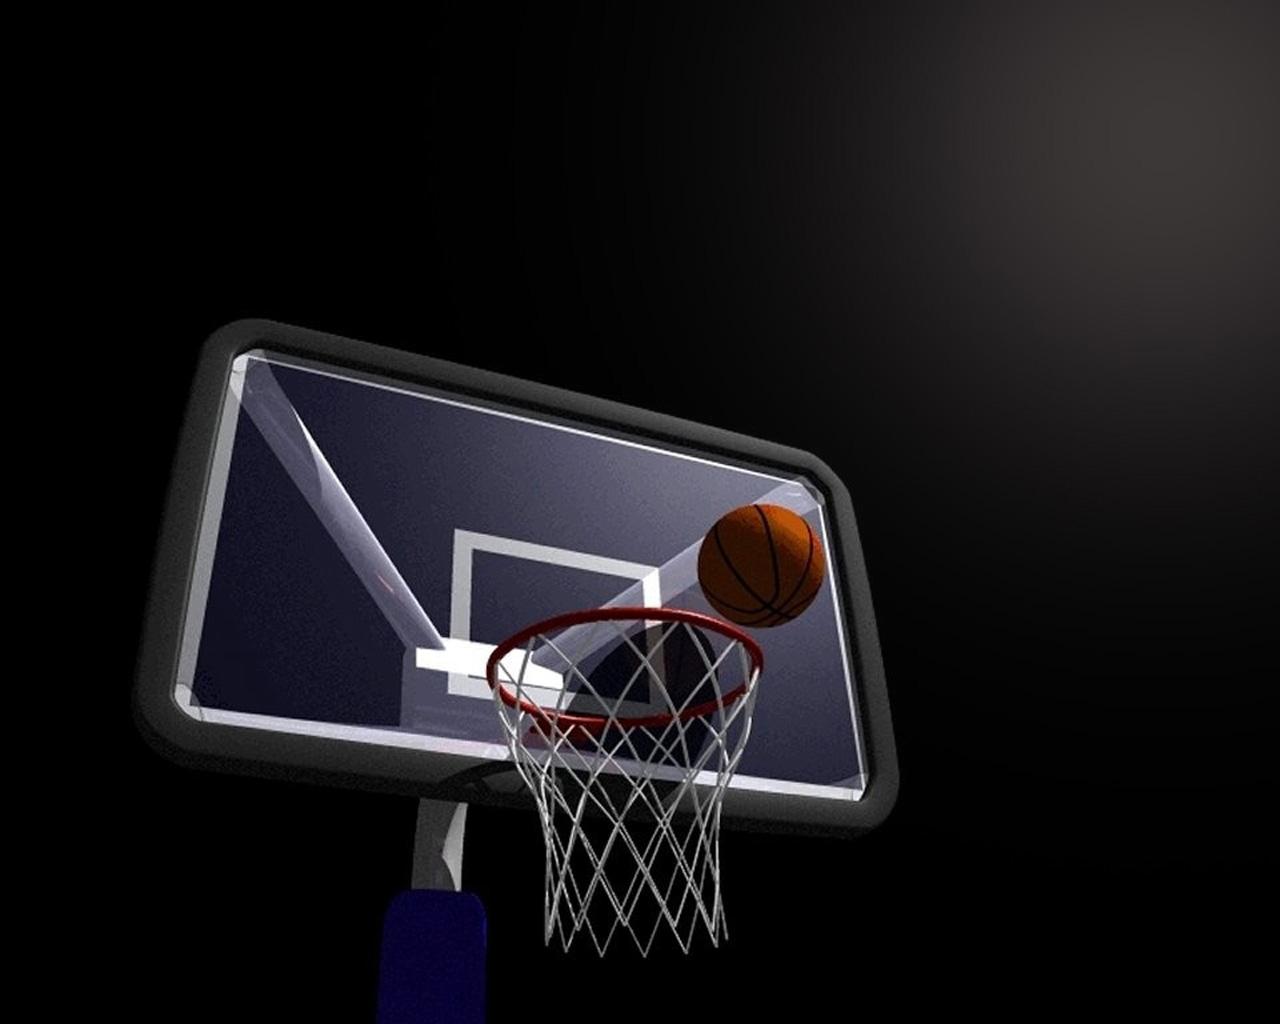 Basketball Wallpapers Hd 12801024 120921 HD Wallpaper Res 1280x1024